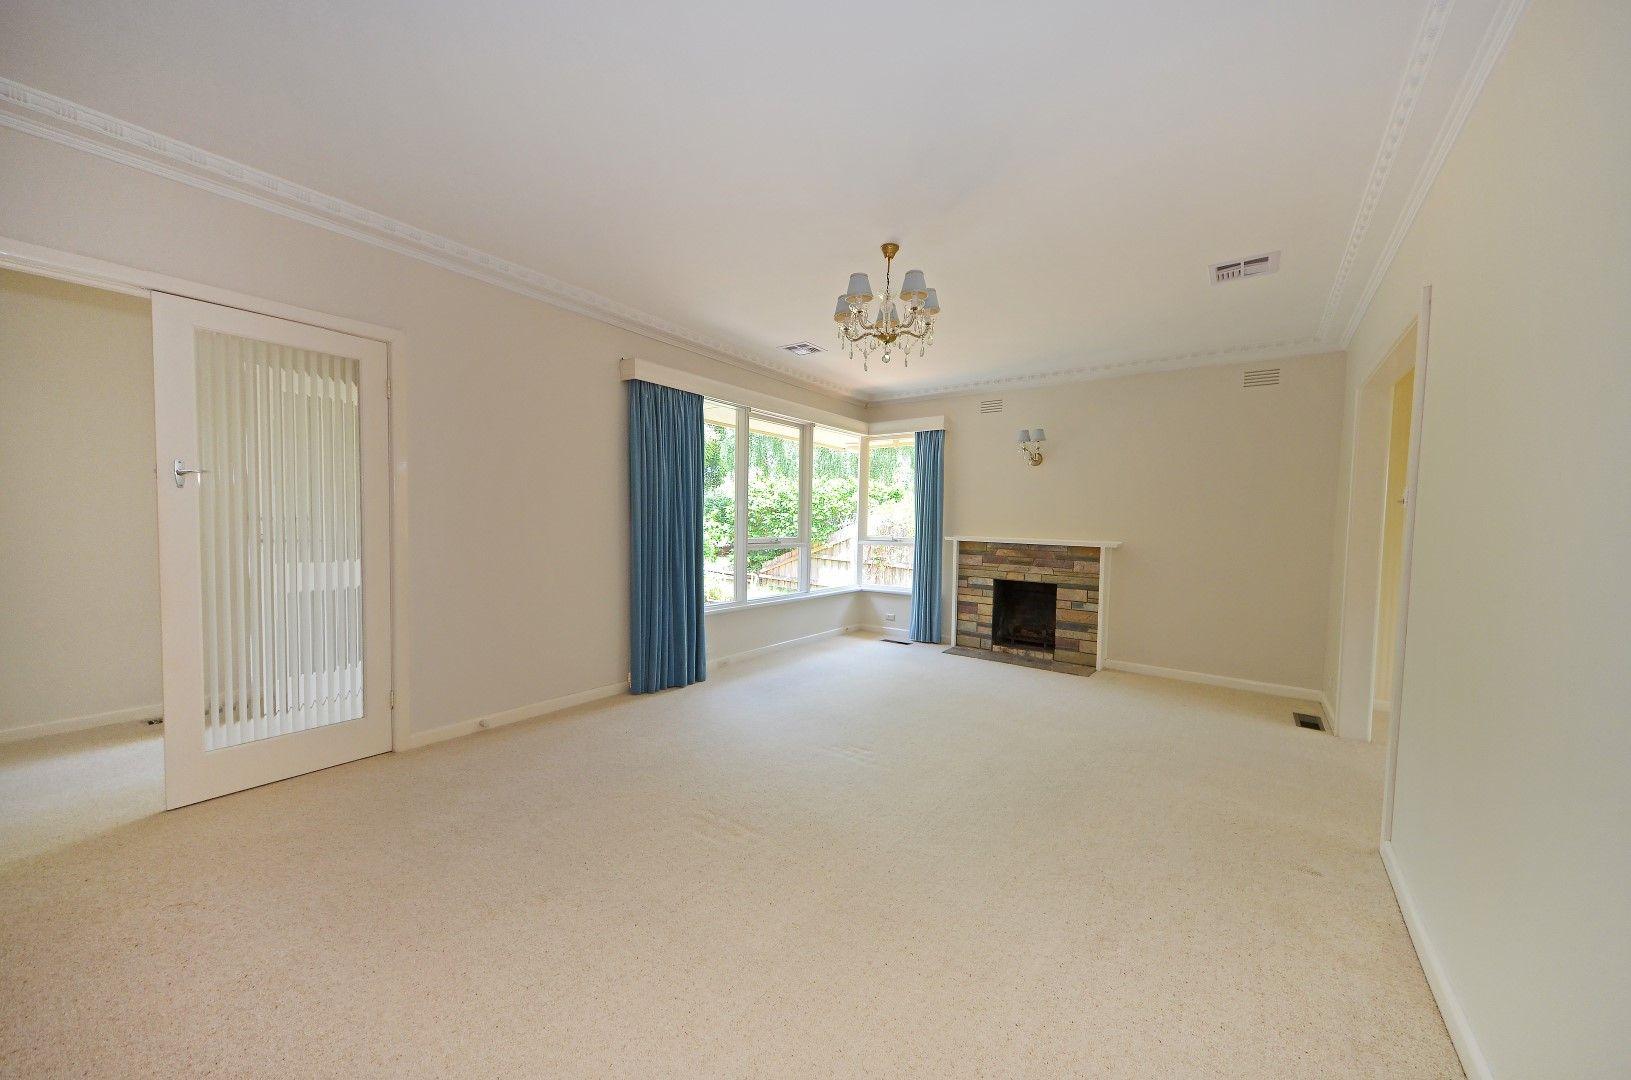 29 Viewpoint Avenue, Glen Waverley VIC 3150, Image 2